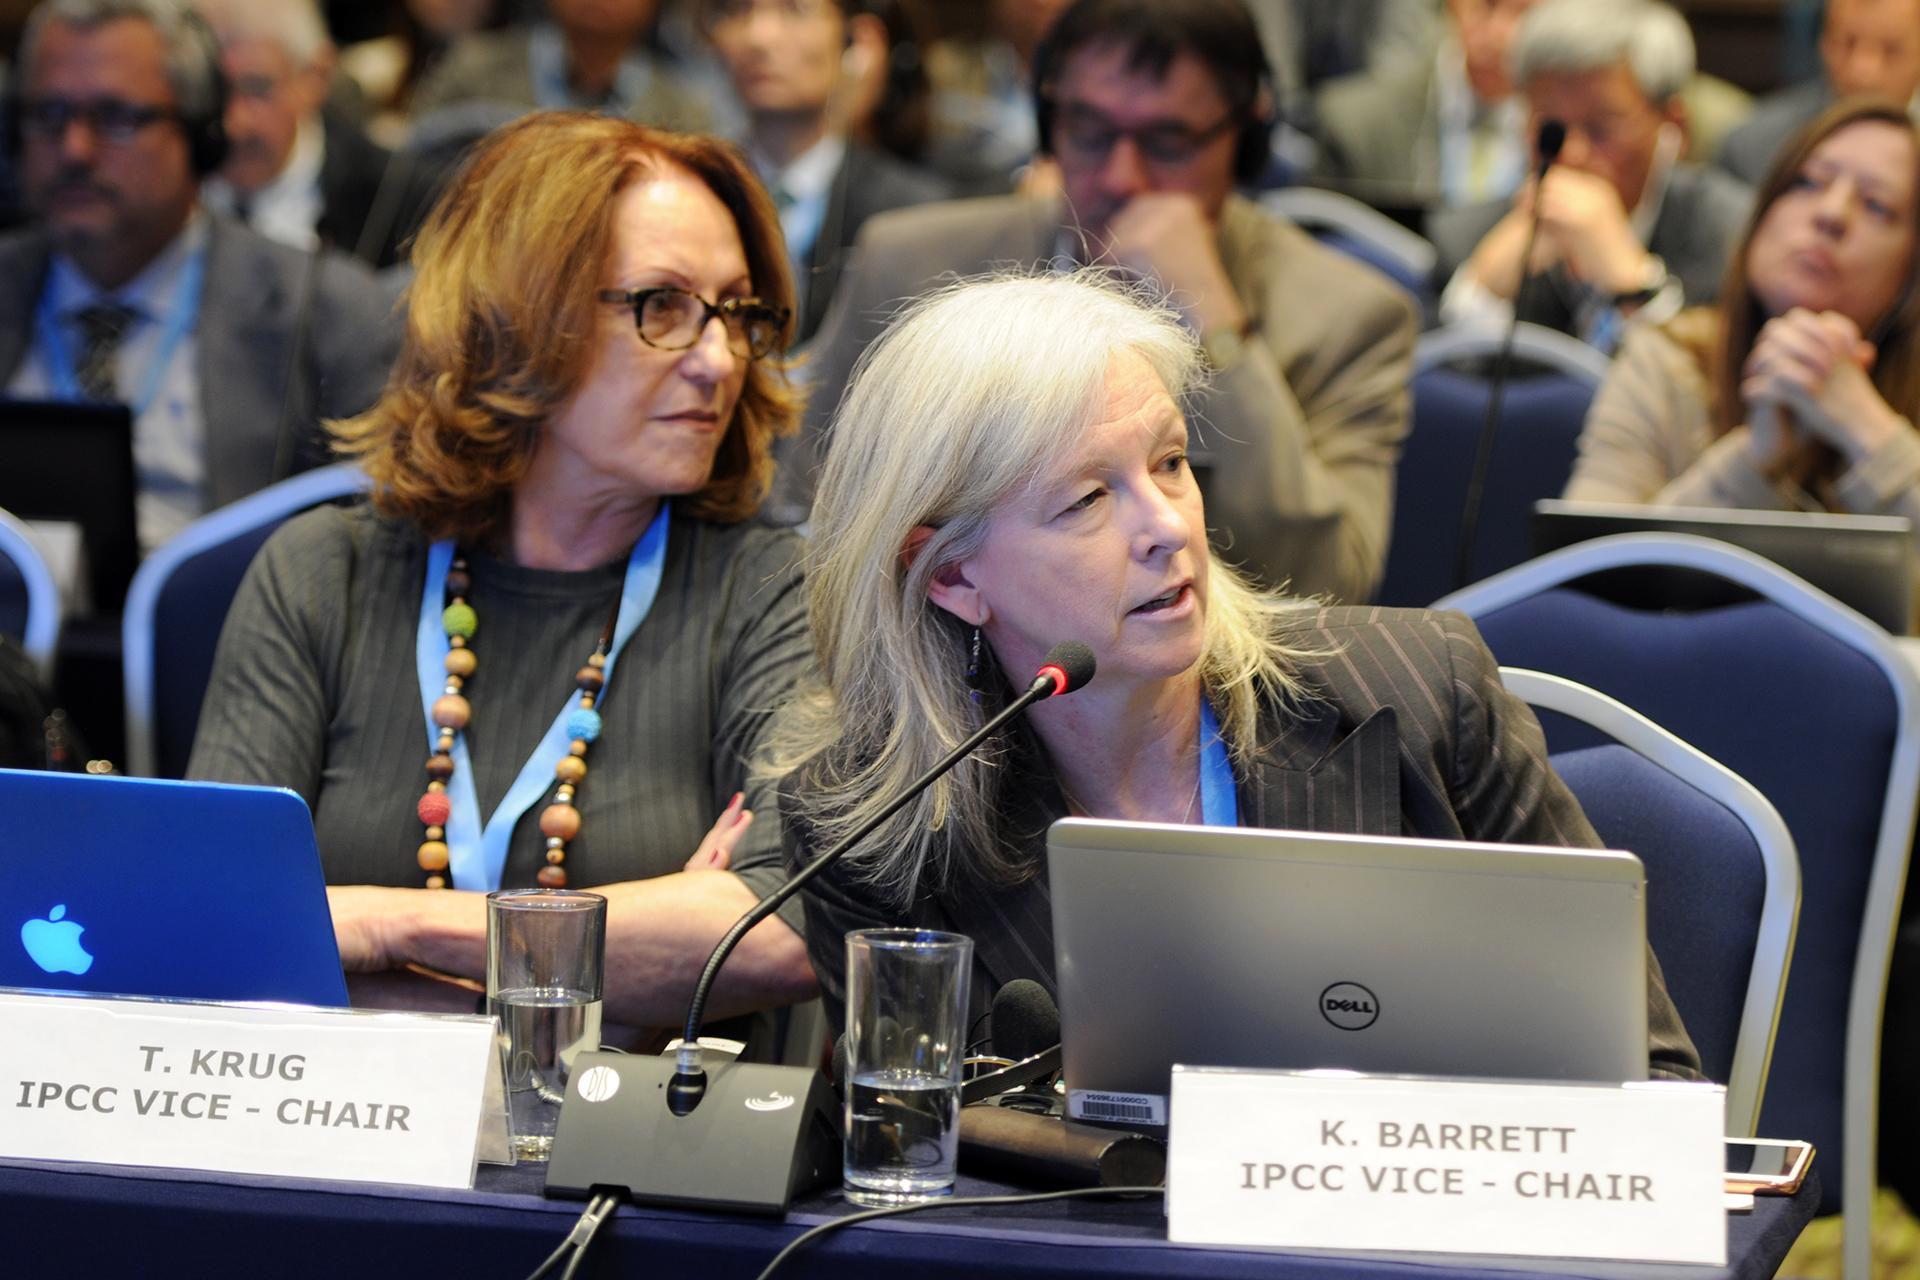 A photo of Ko Barrett behind her name plate at an IPCC meeting